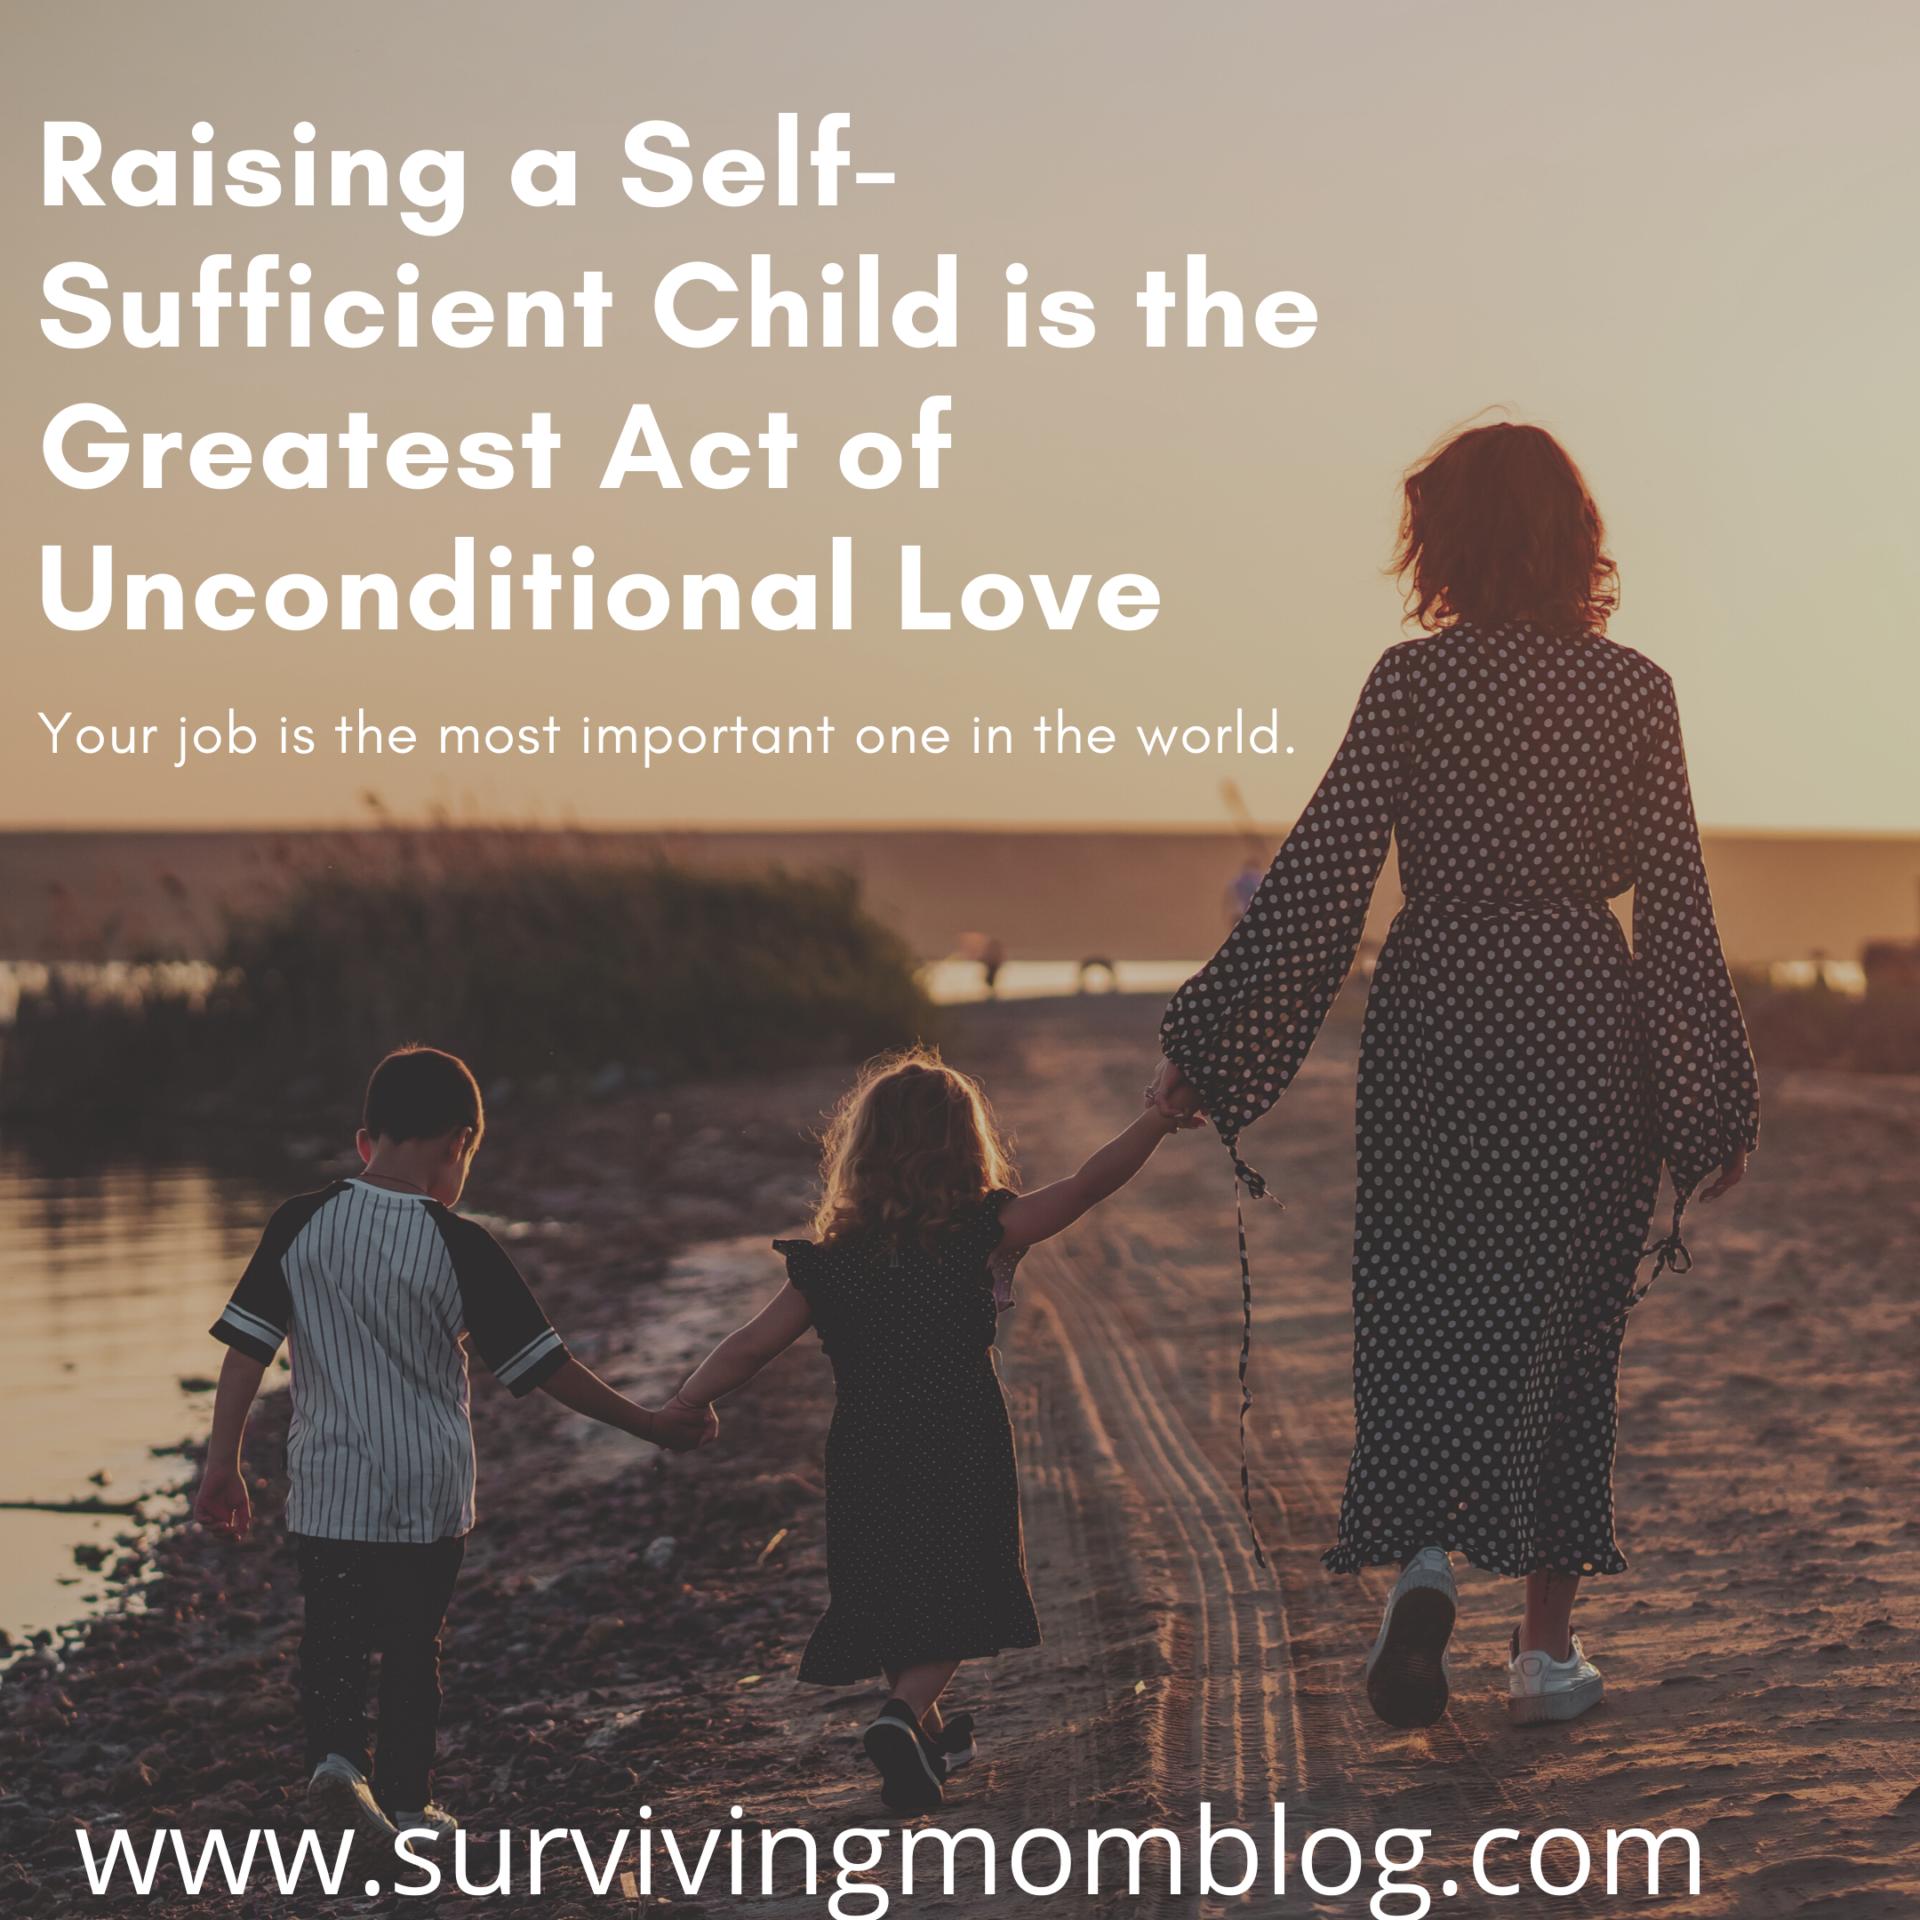 raising a self-sufficient child